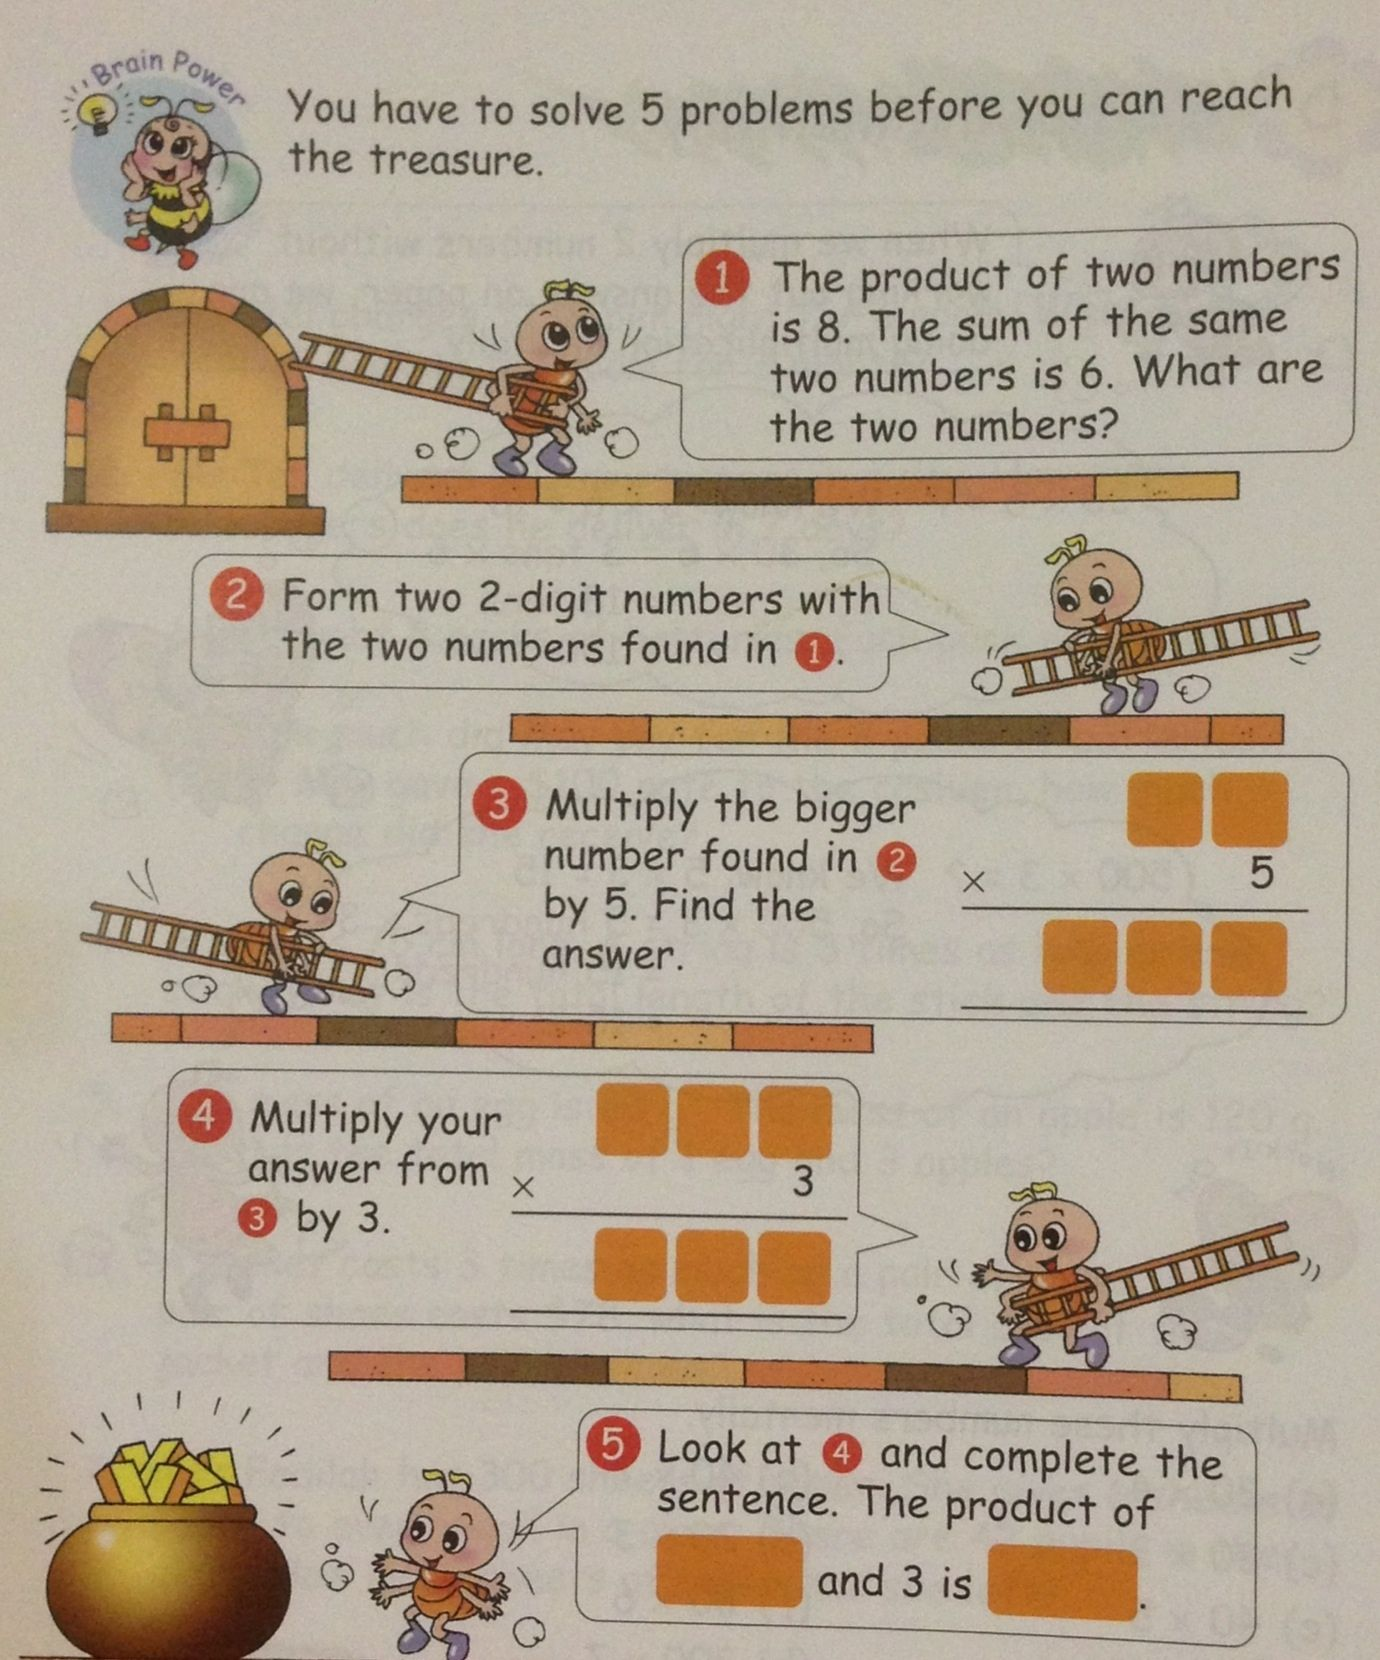 medium resolution of A grade 3 item on mental multiplication. Singapore math   Singapore math